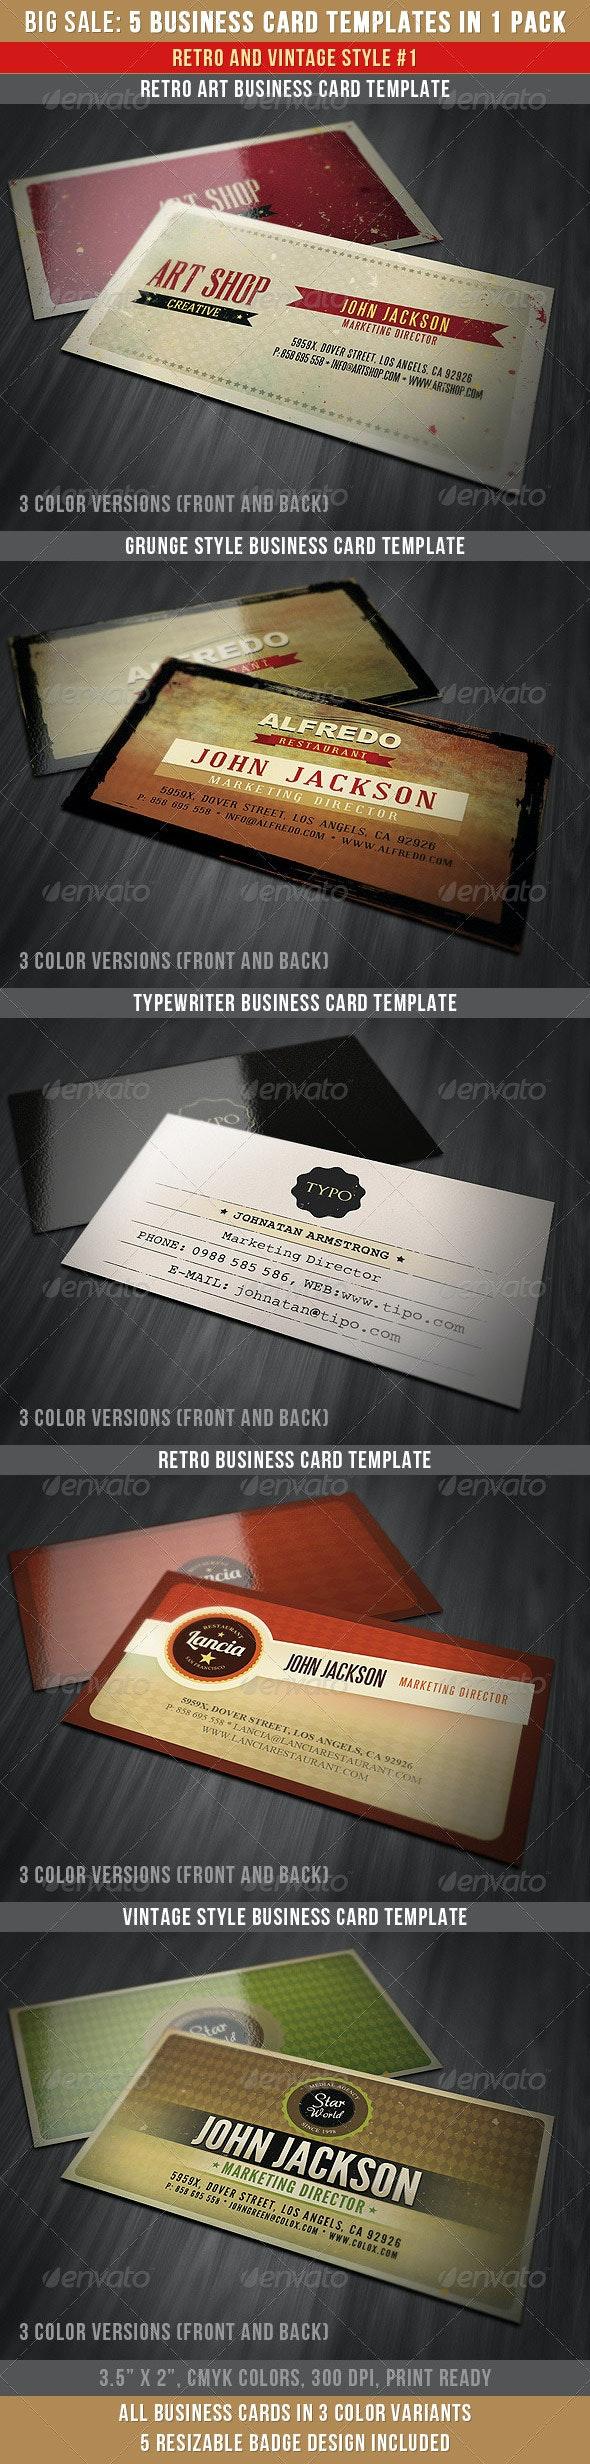 Retro Business Cards Bundle - Retro/Vintage Business Cards